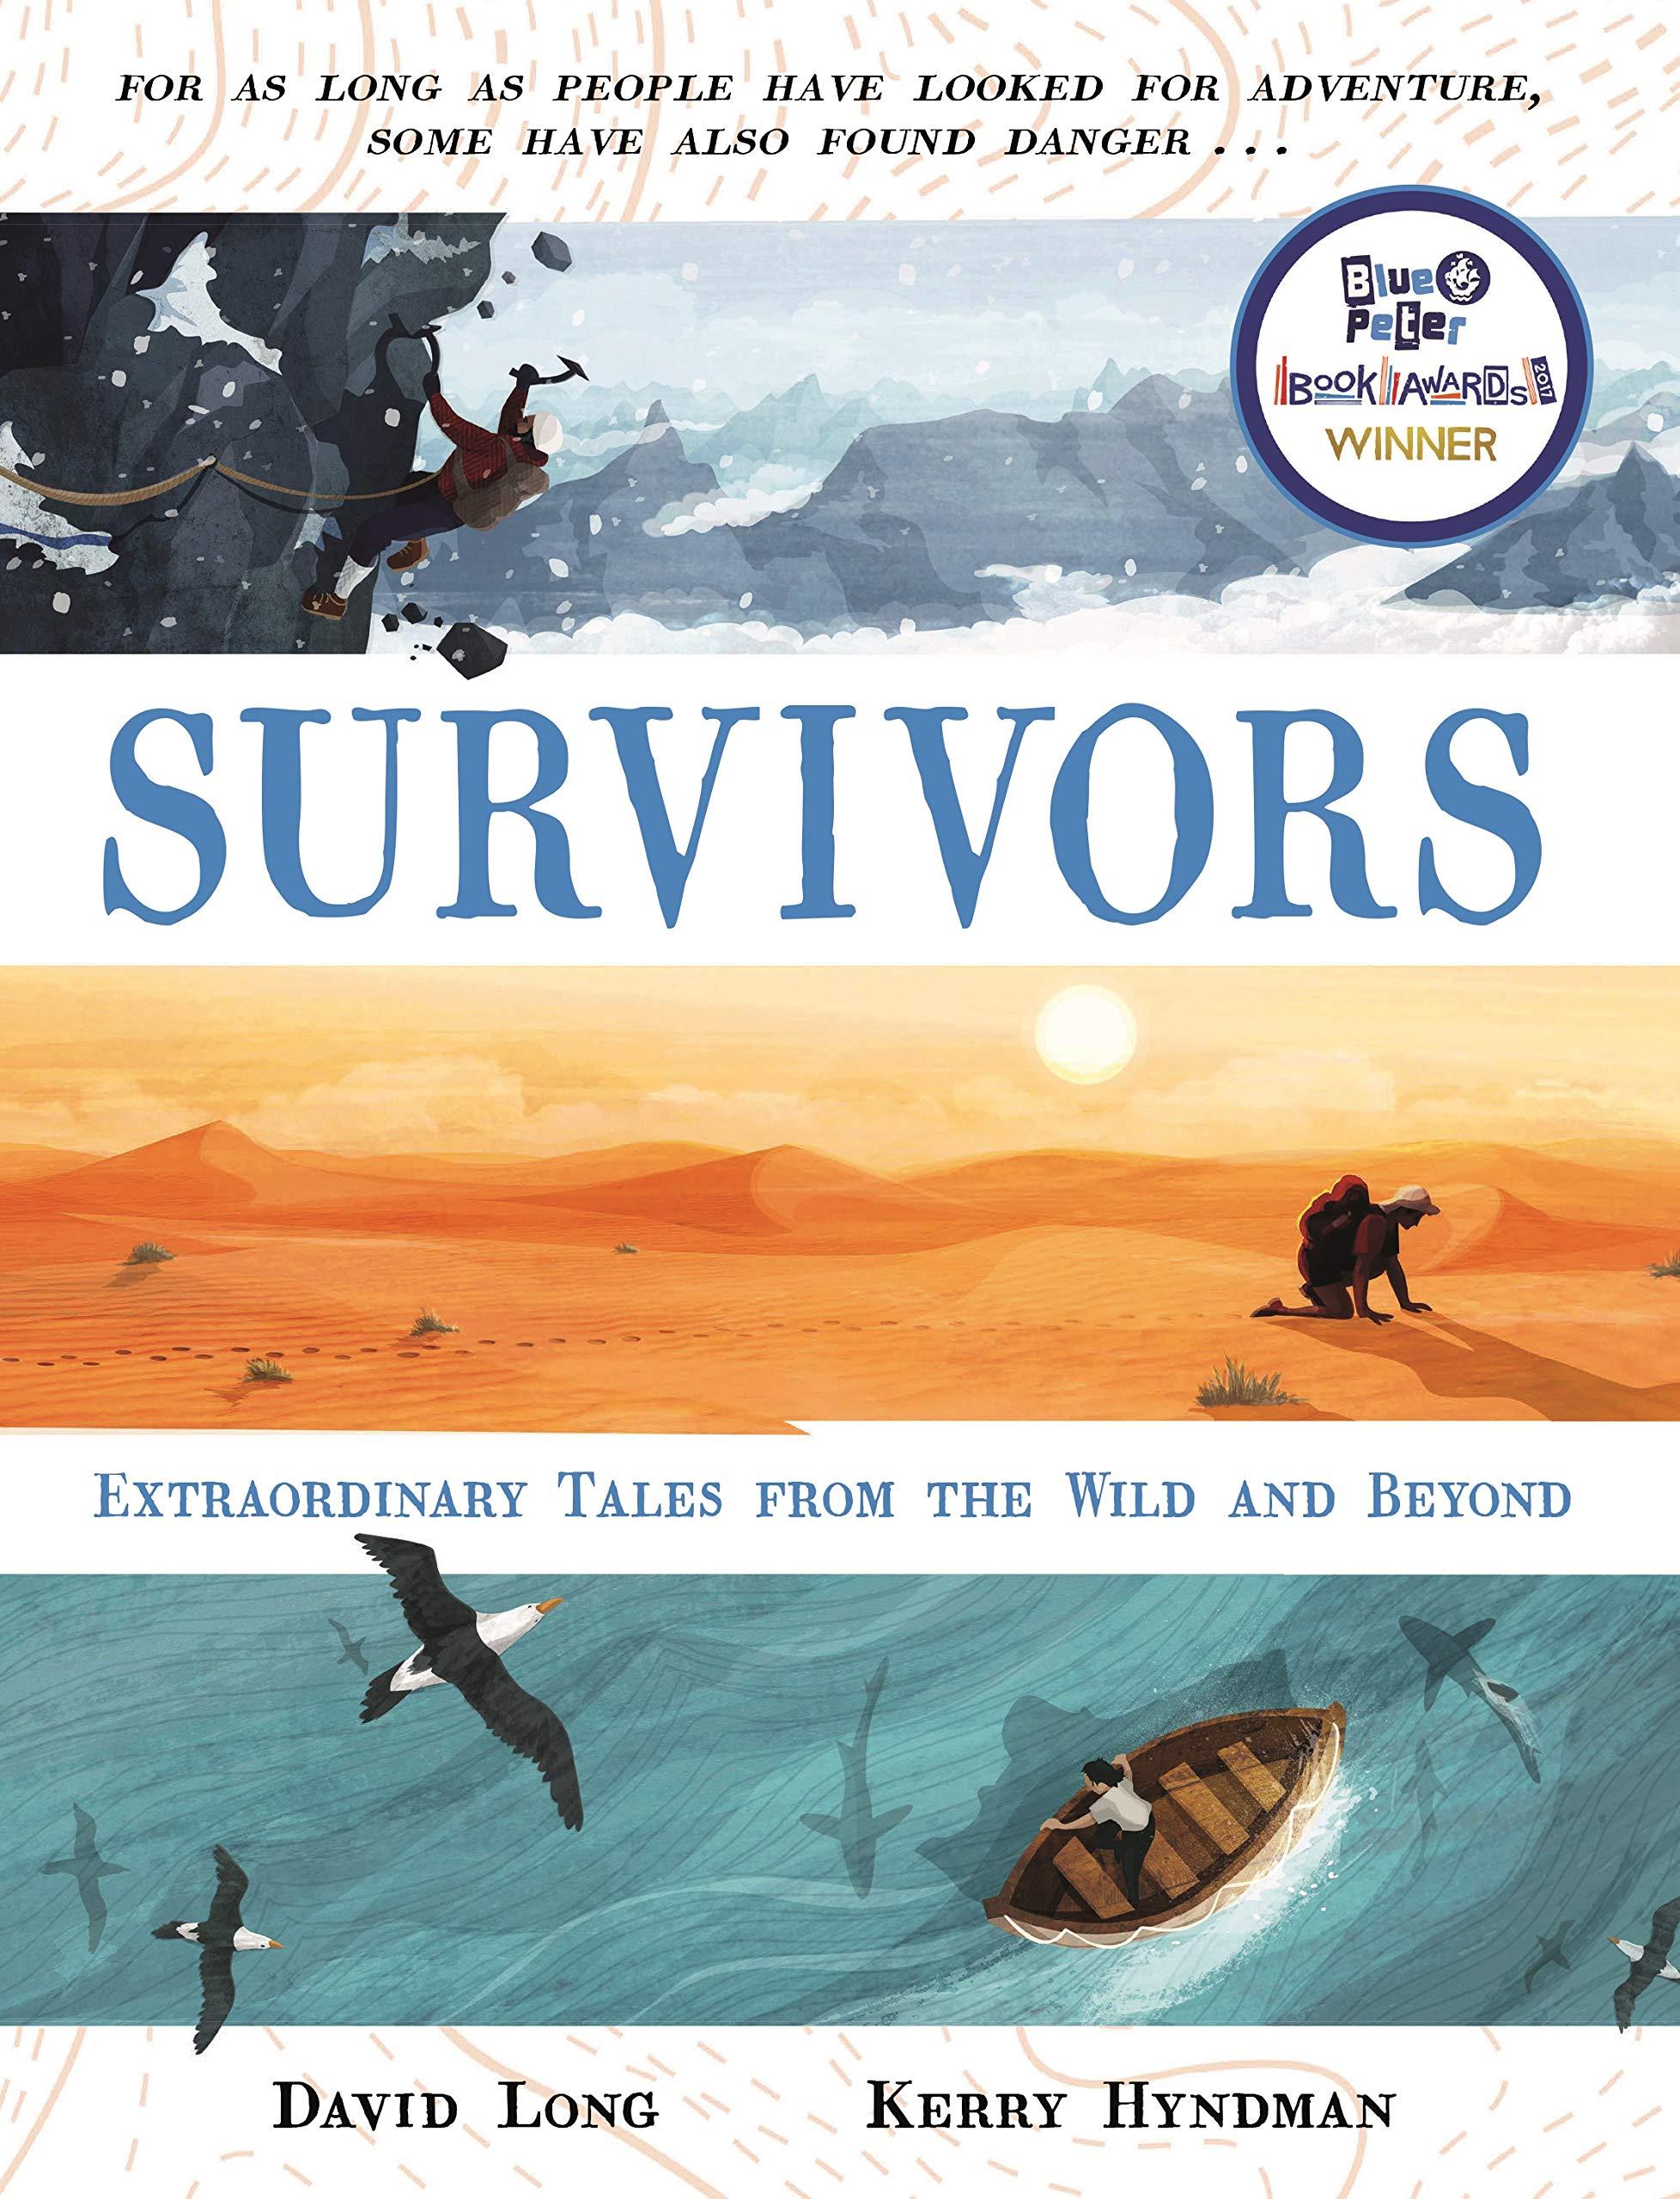 Survivors: David Long: 1: Amazon.co.uk: Long, David, Hyndman, Kerry: Books